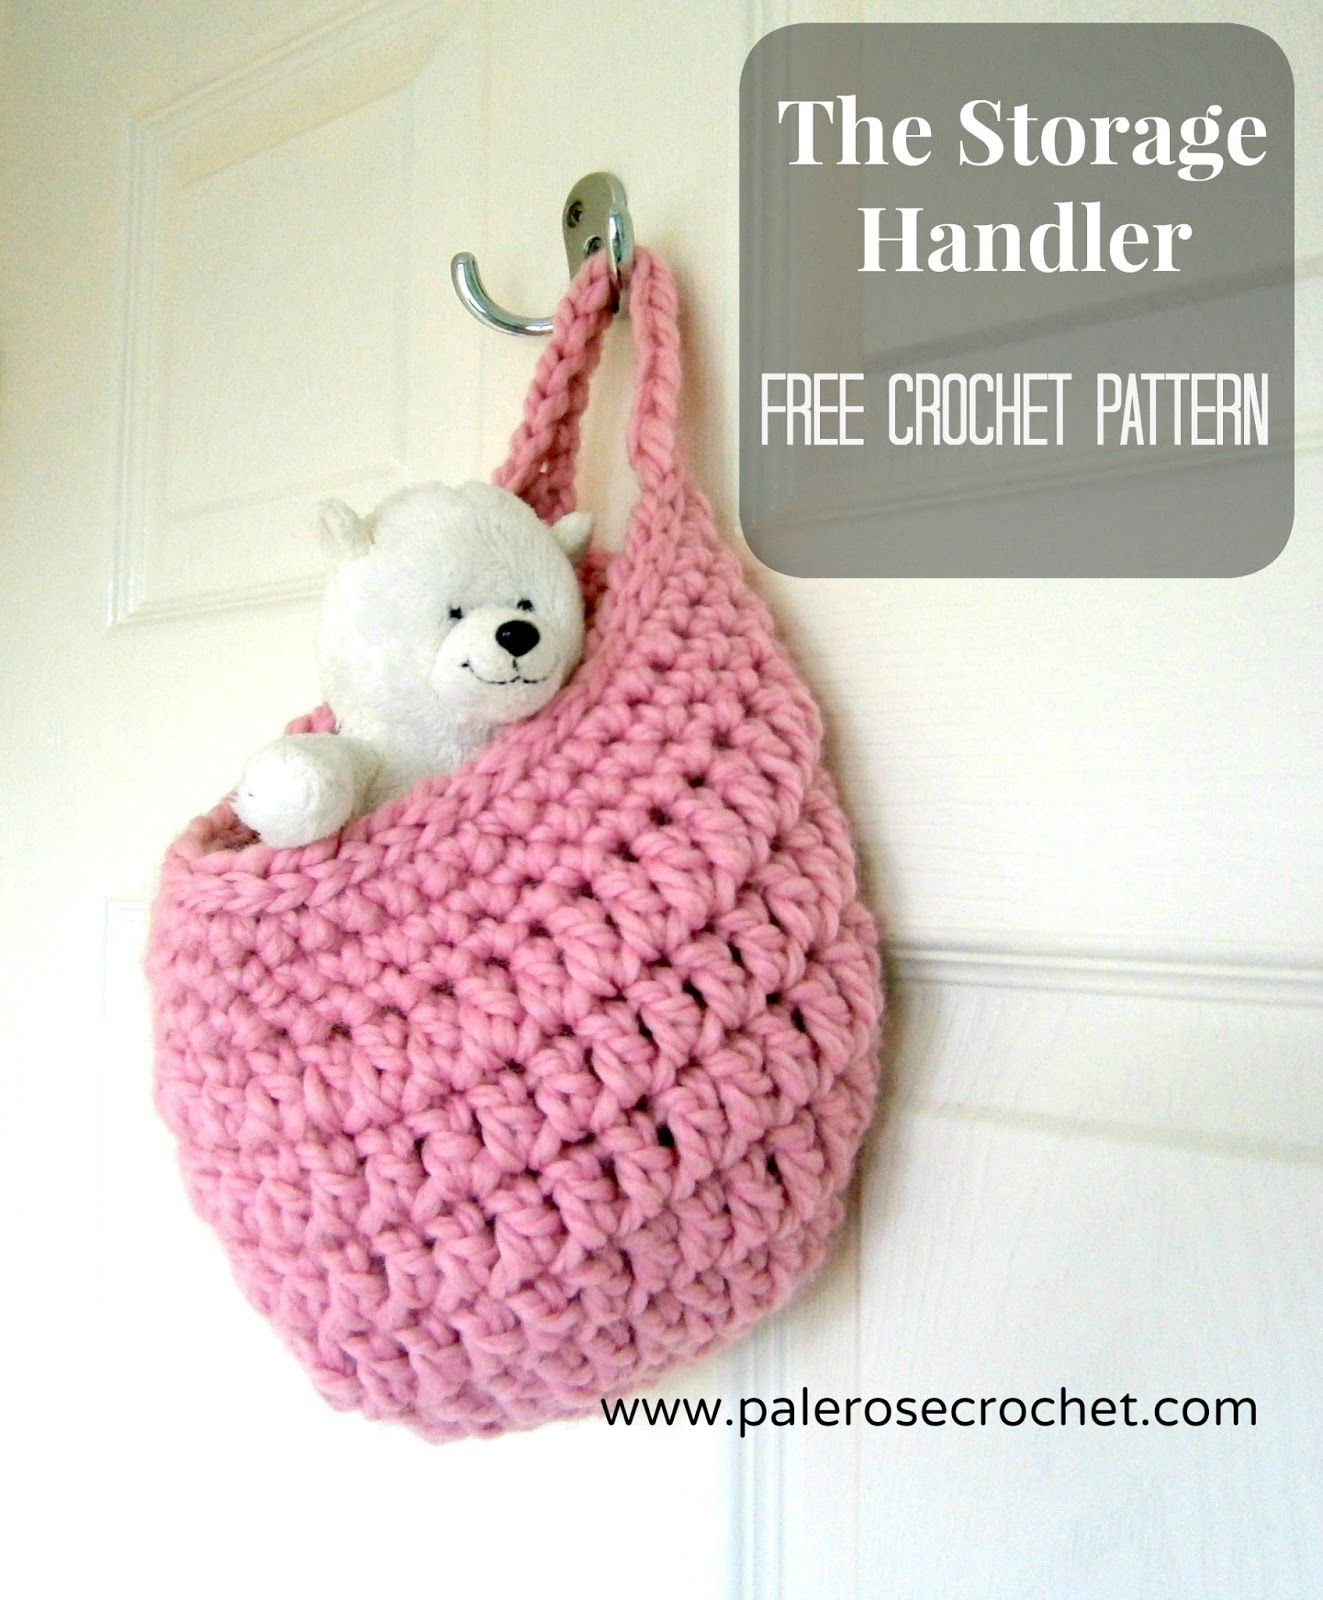 Pale Rose Crochet: The Storage Handler Crochet Pattern free storage ...